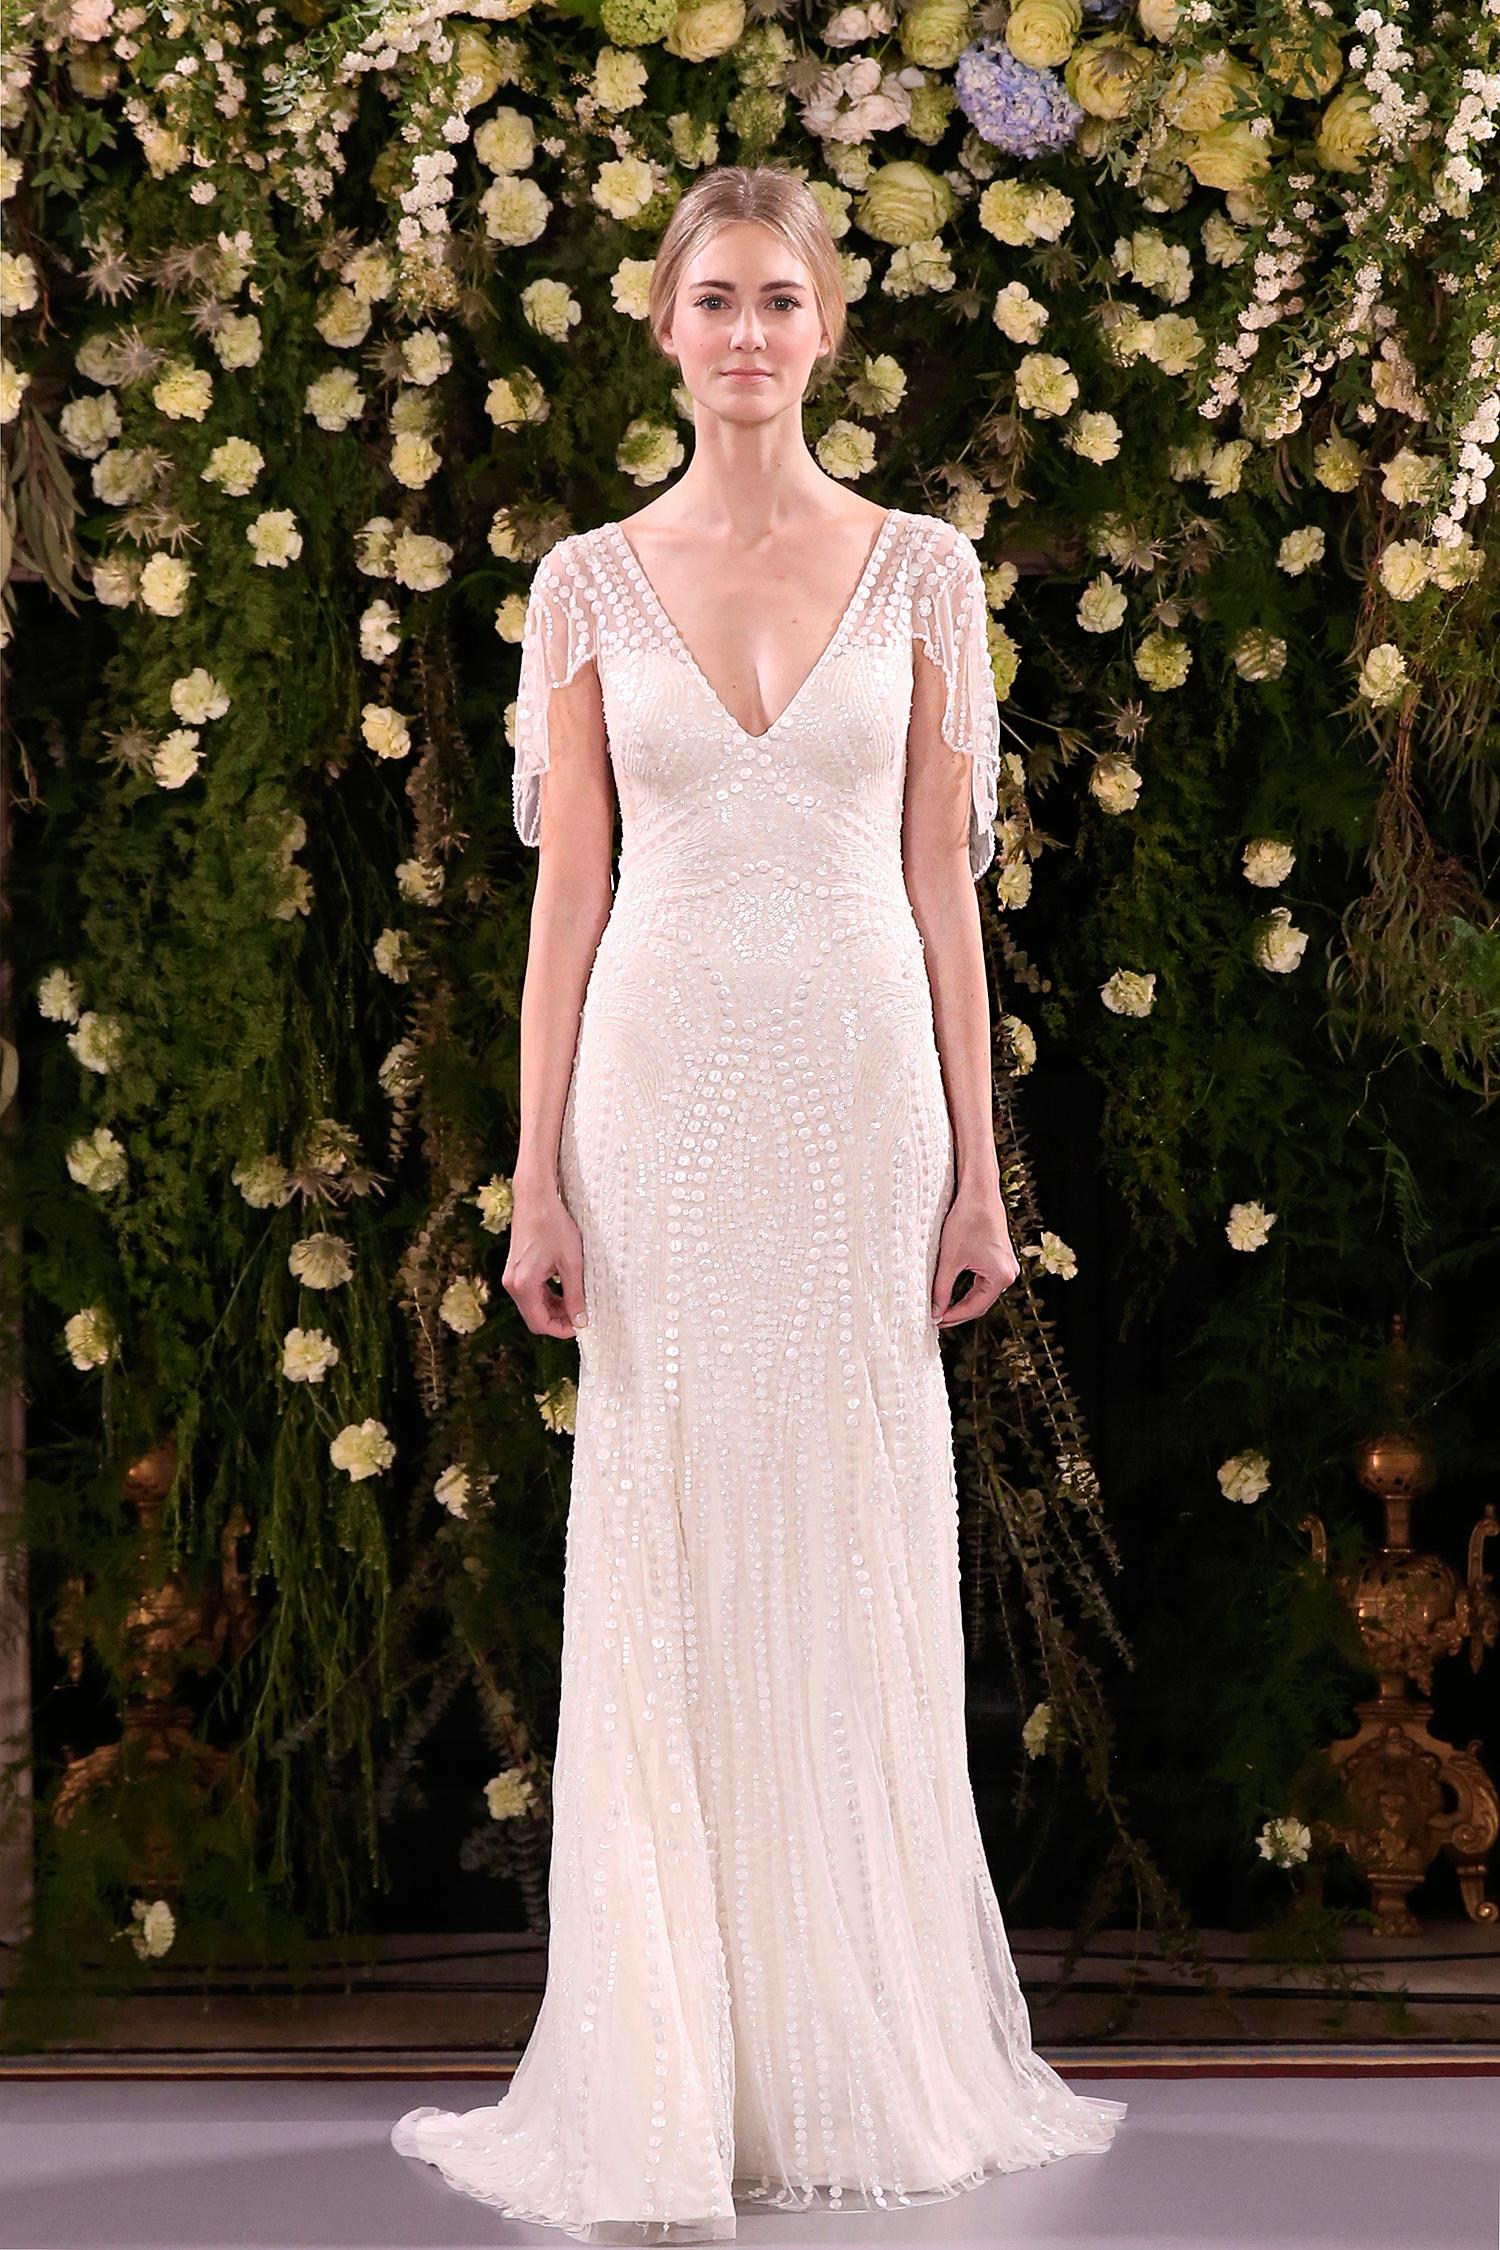 jenny packham wedding dress spring 2019 v-neck sleeve detail beadwork